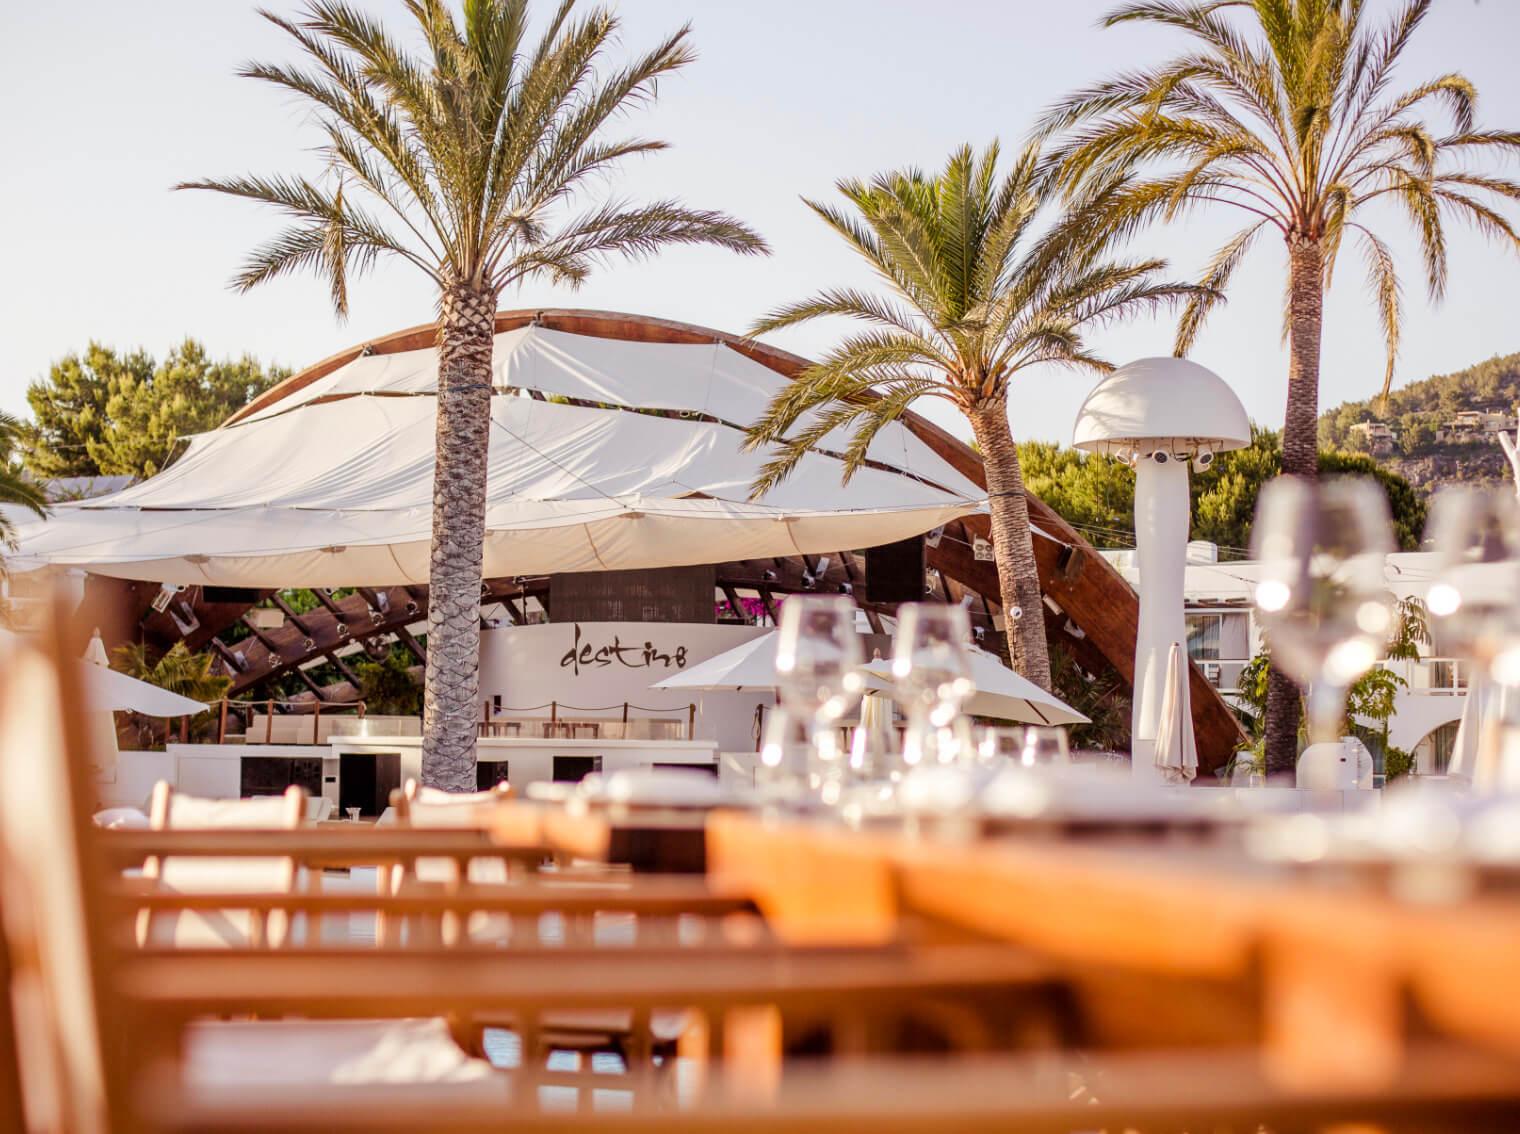 Destino Pacha Resort, Ibiza joins Luxury Lifestyle International as a new Global Platinum Advertising Partner